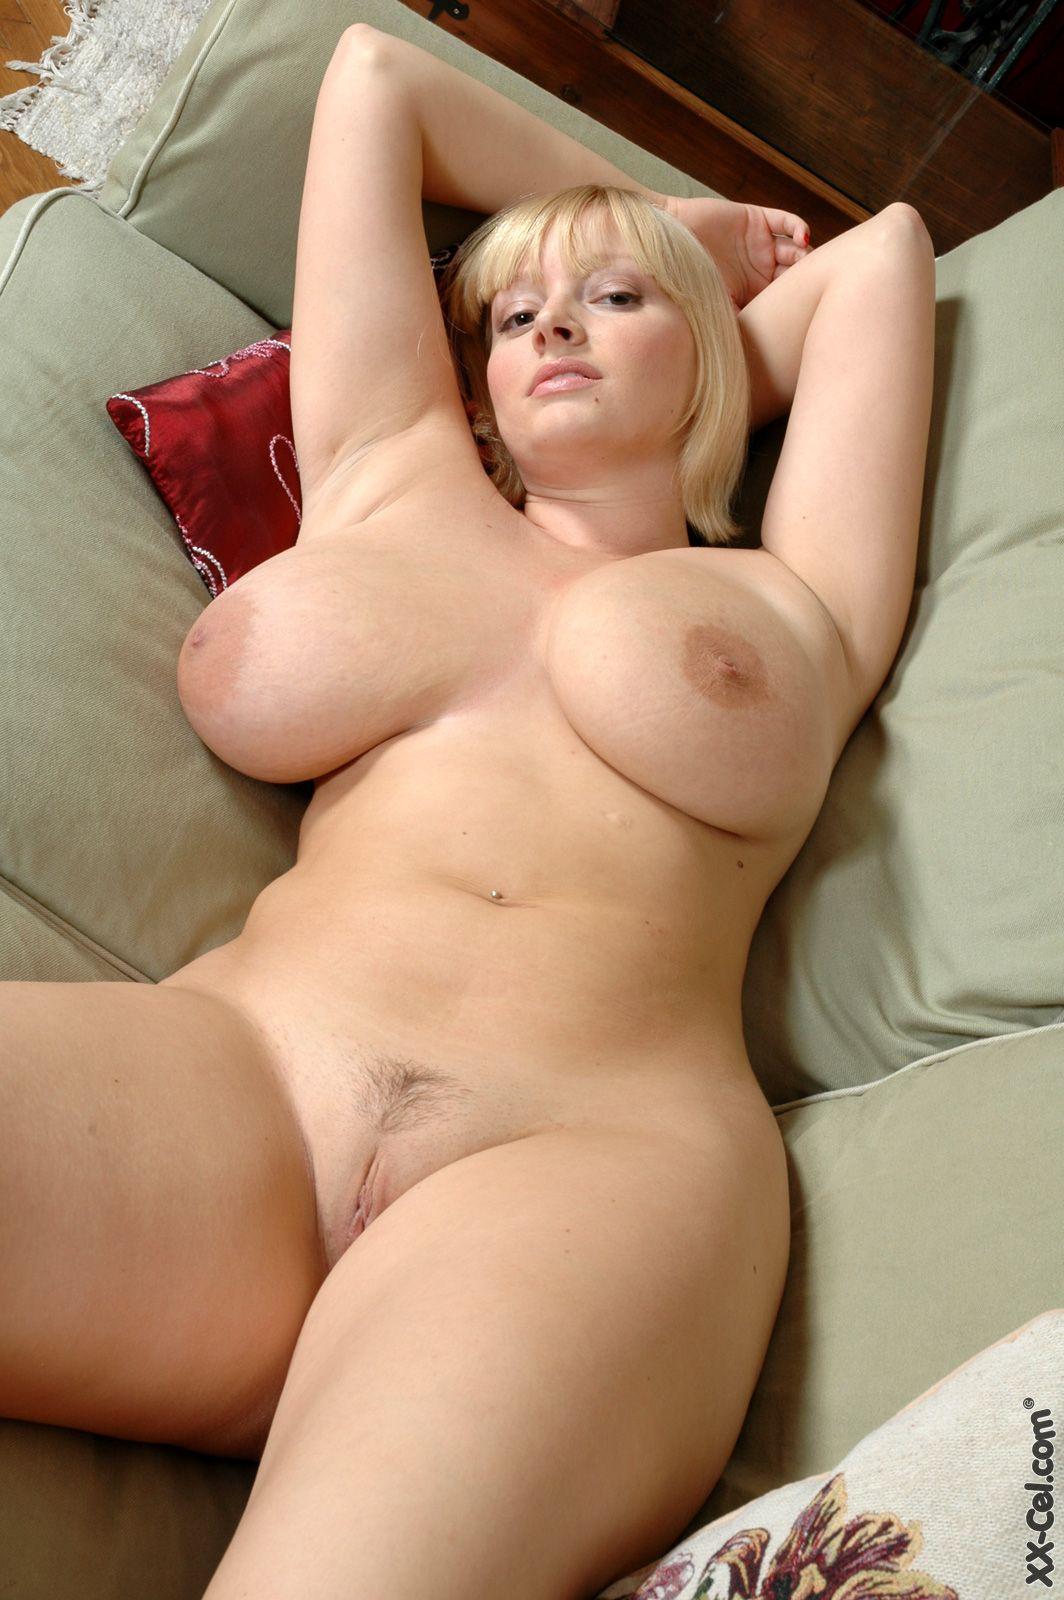 Rose mcgowan nude pus